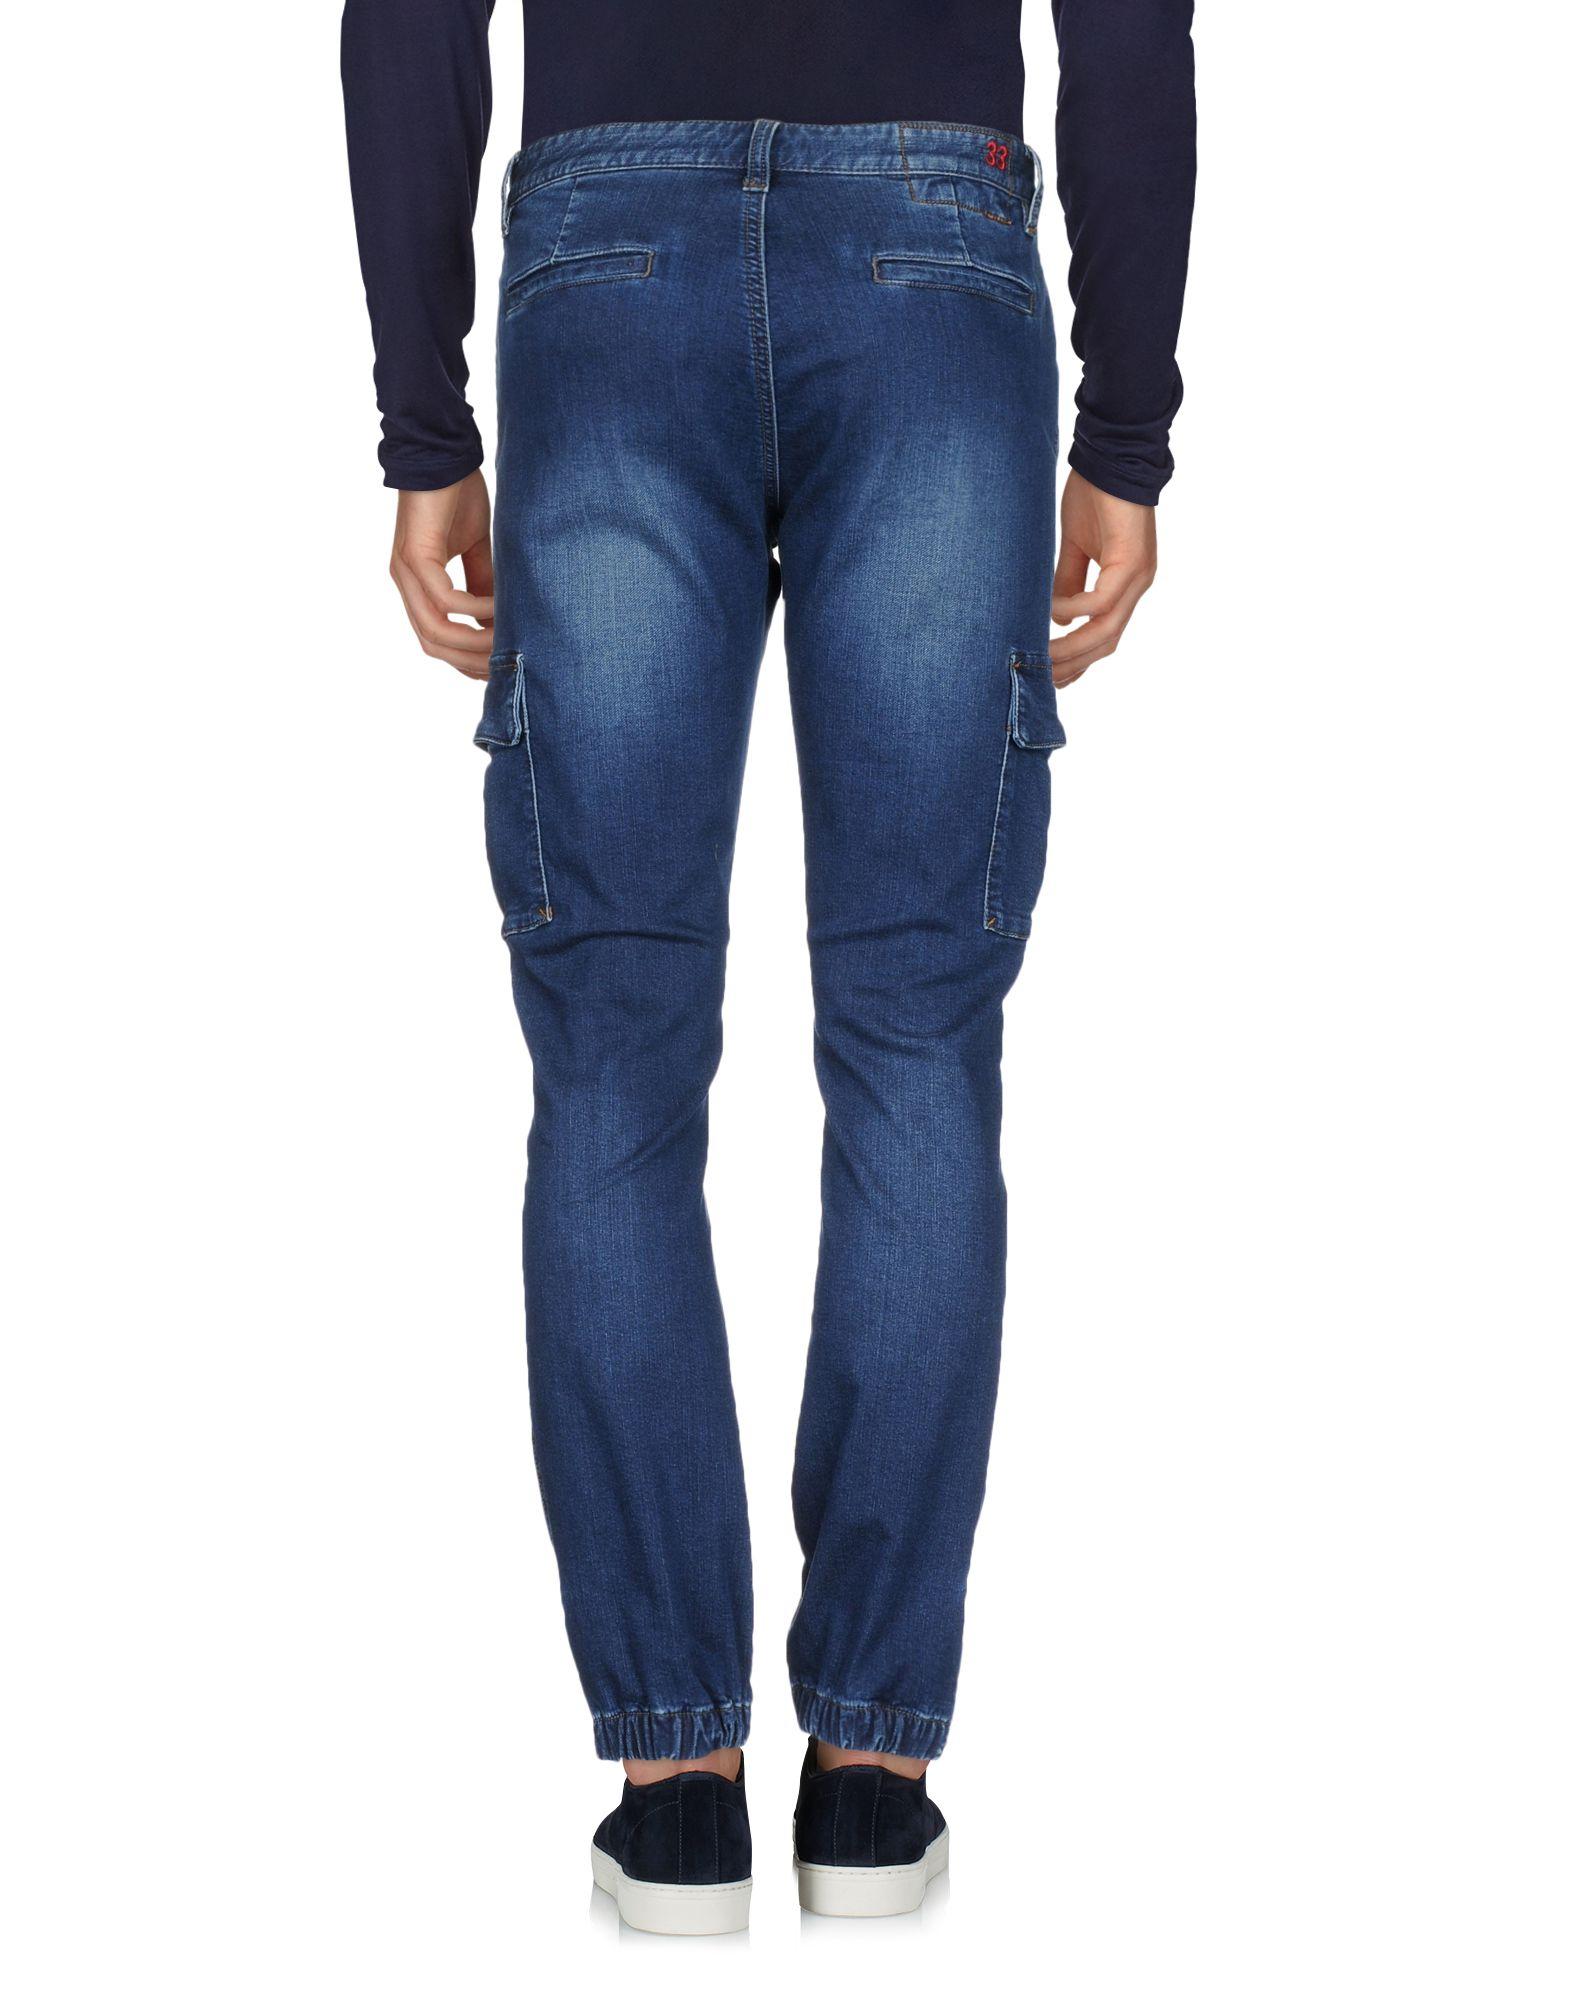 Pantaloni Jeans Sun 68 Uomo Uomo 68 - 42667741OR e2967e